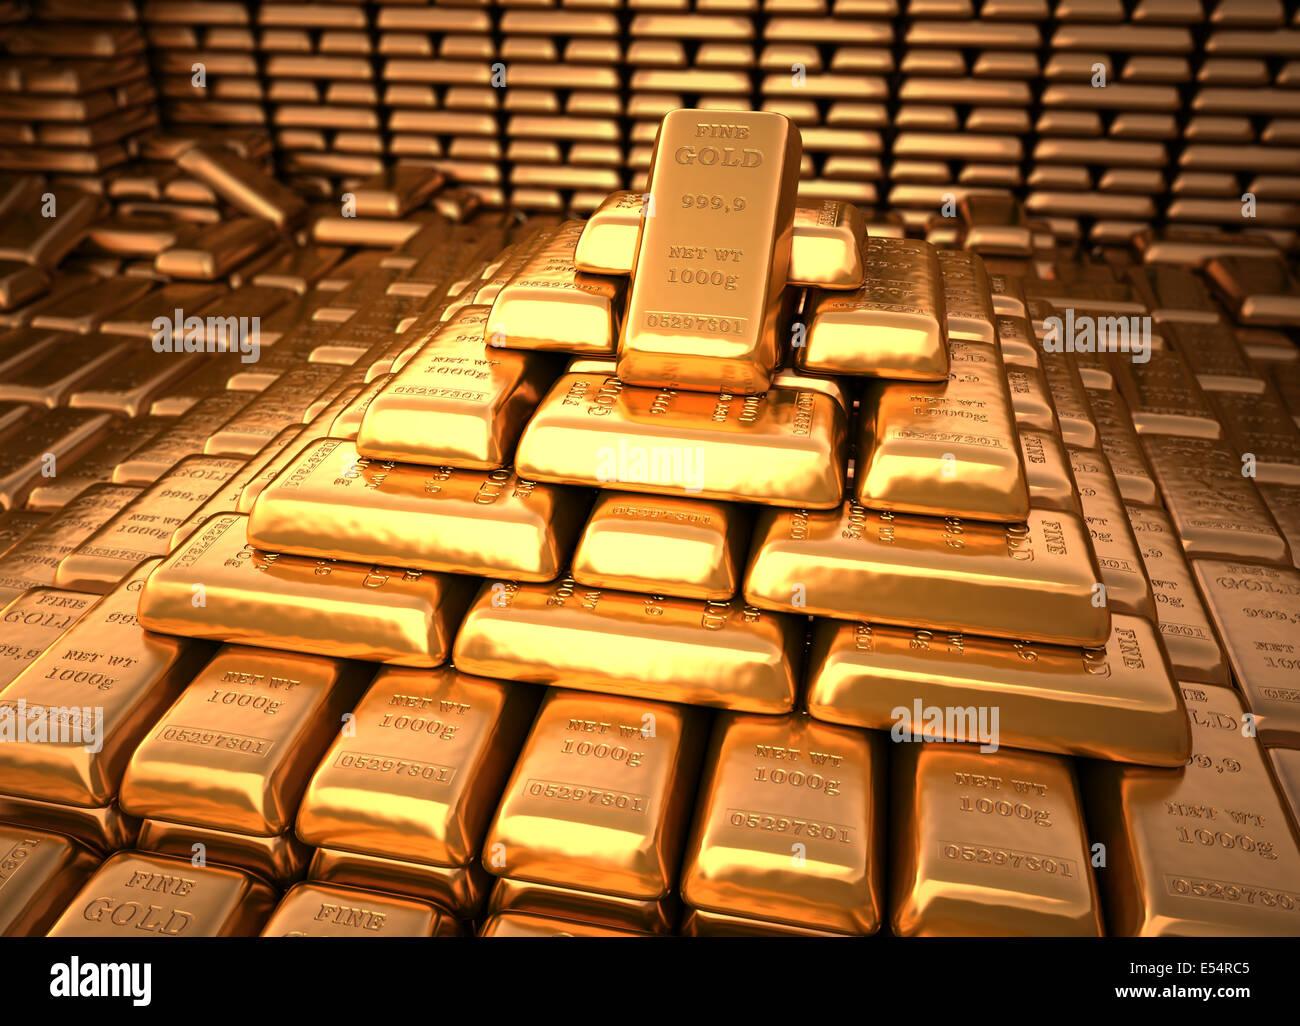 Bank vault filled with gold bullion. Finance illustration - Stock Image